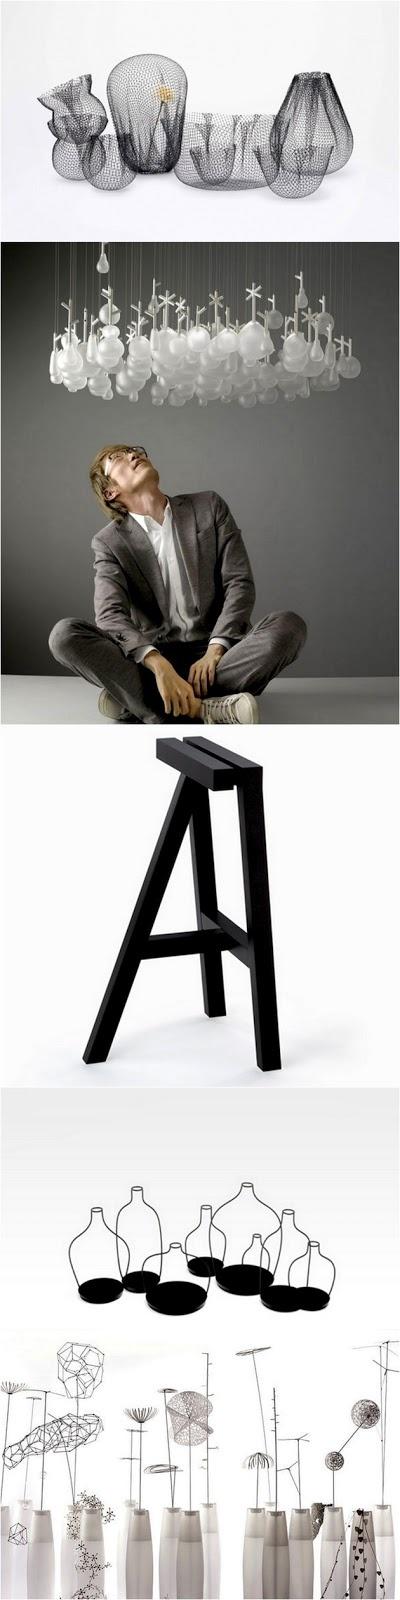 WABI SABI Scandinavia - Design, Art and DIY.: Stockholm Furniture Fair 2013: Oki Sato